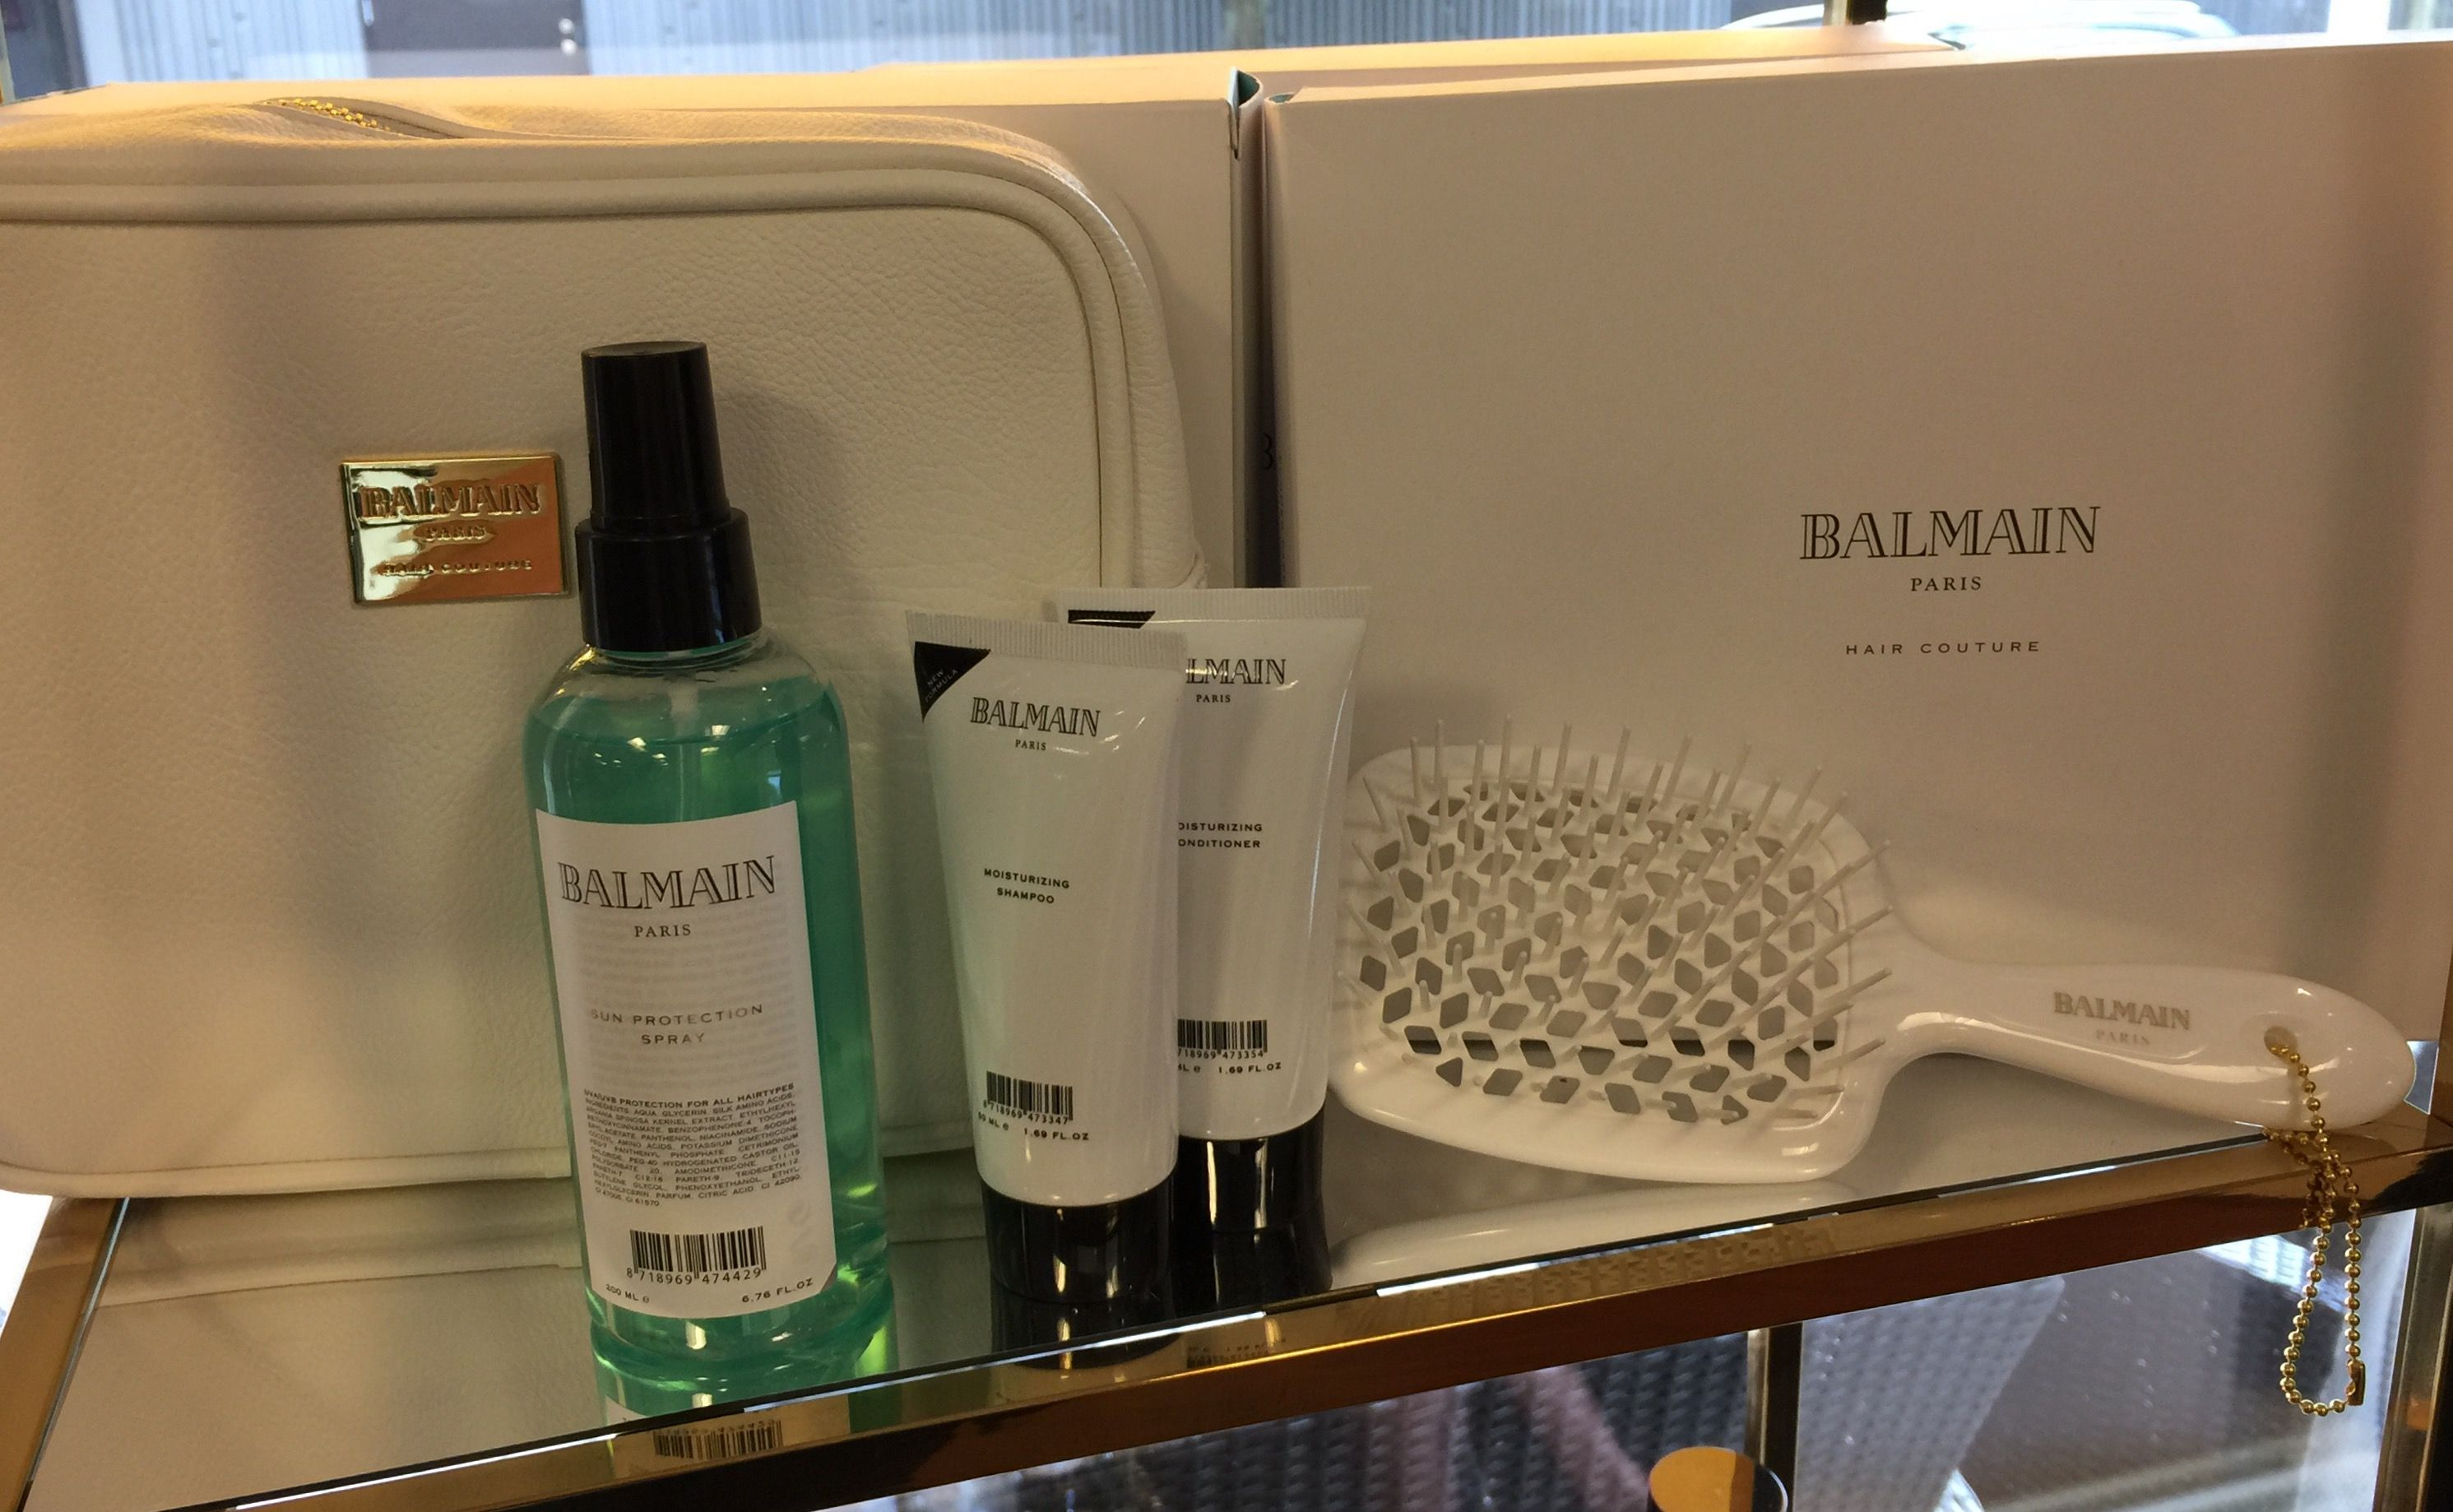 Balmain Hair Couture & Products  Salon InSite Denmark www.saloninsite.dk…